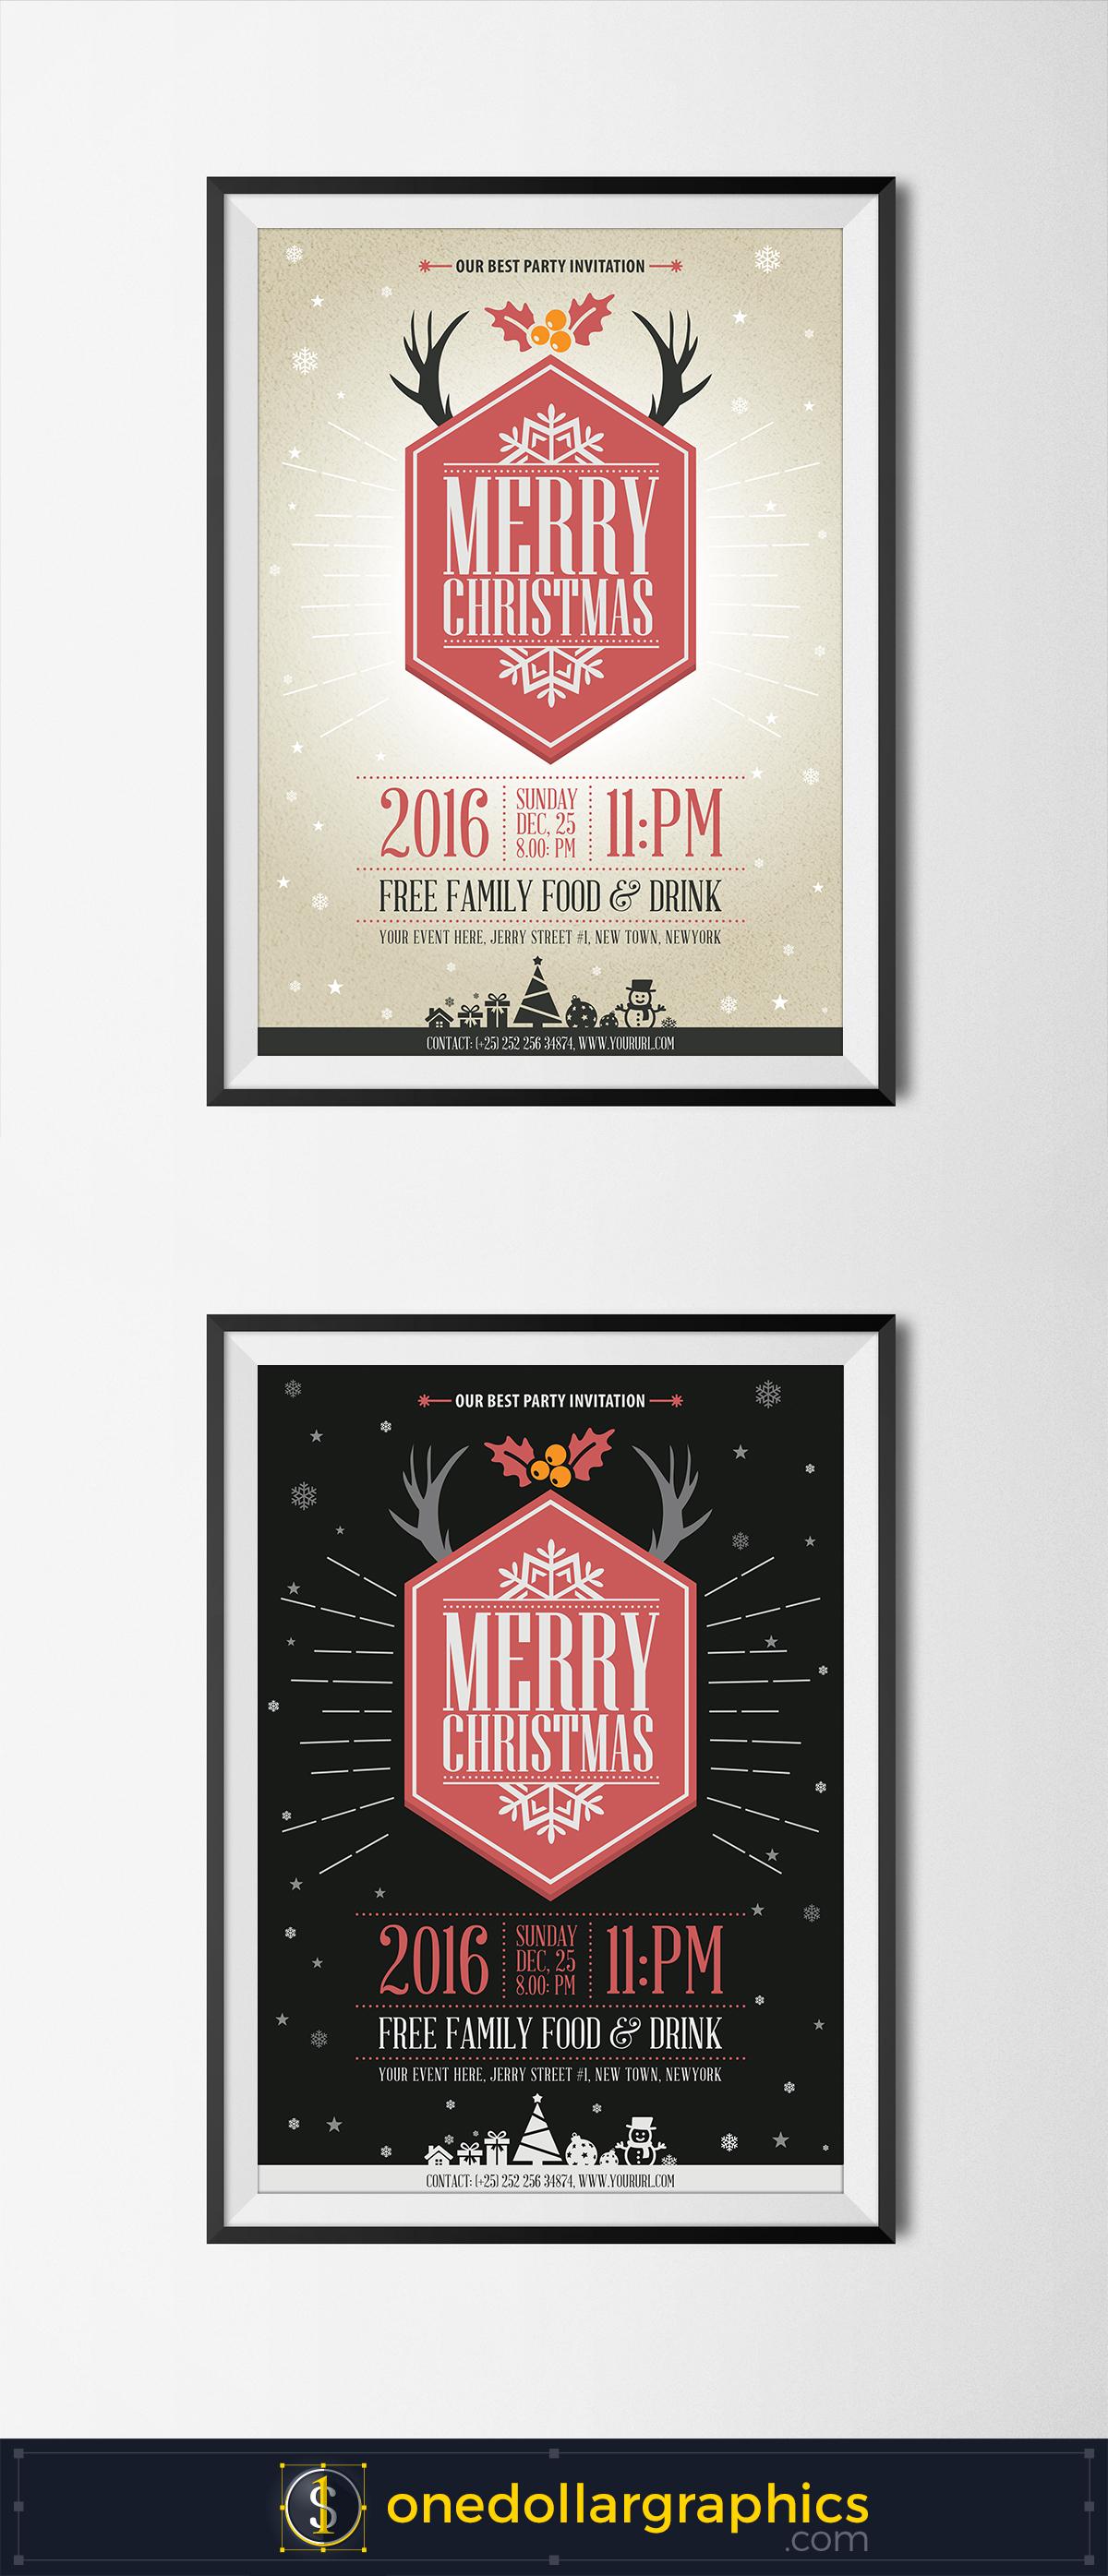 free-vintage-christmas-flyer-template-design